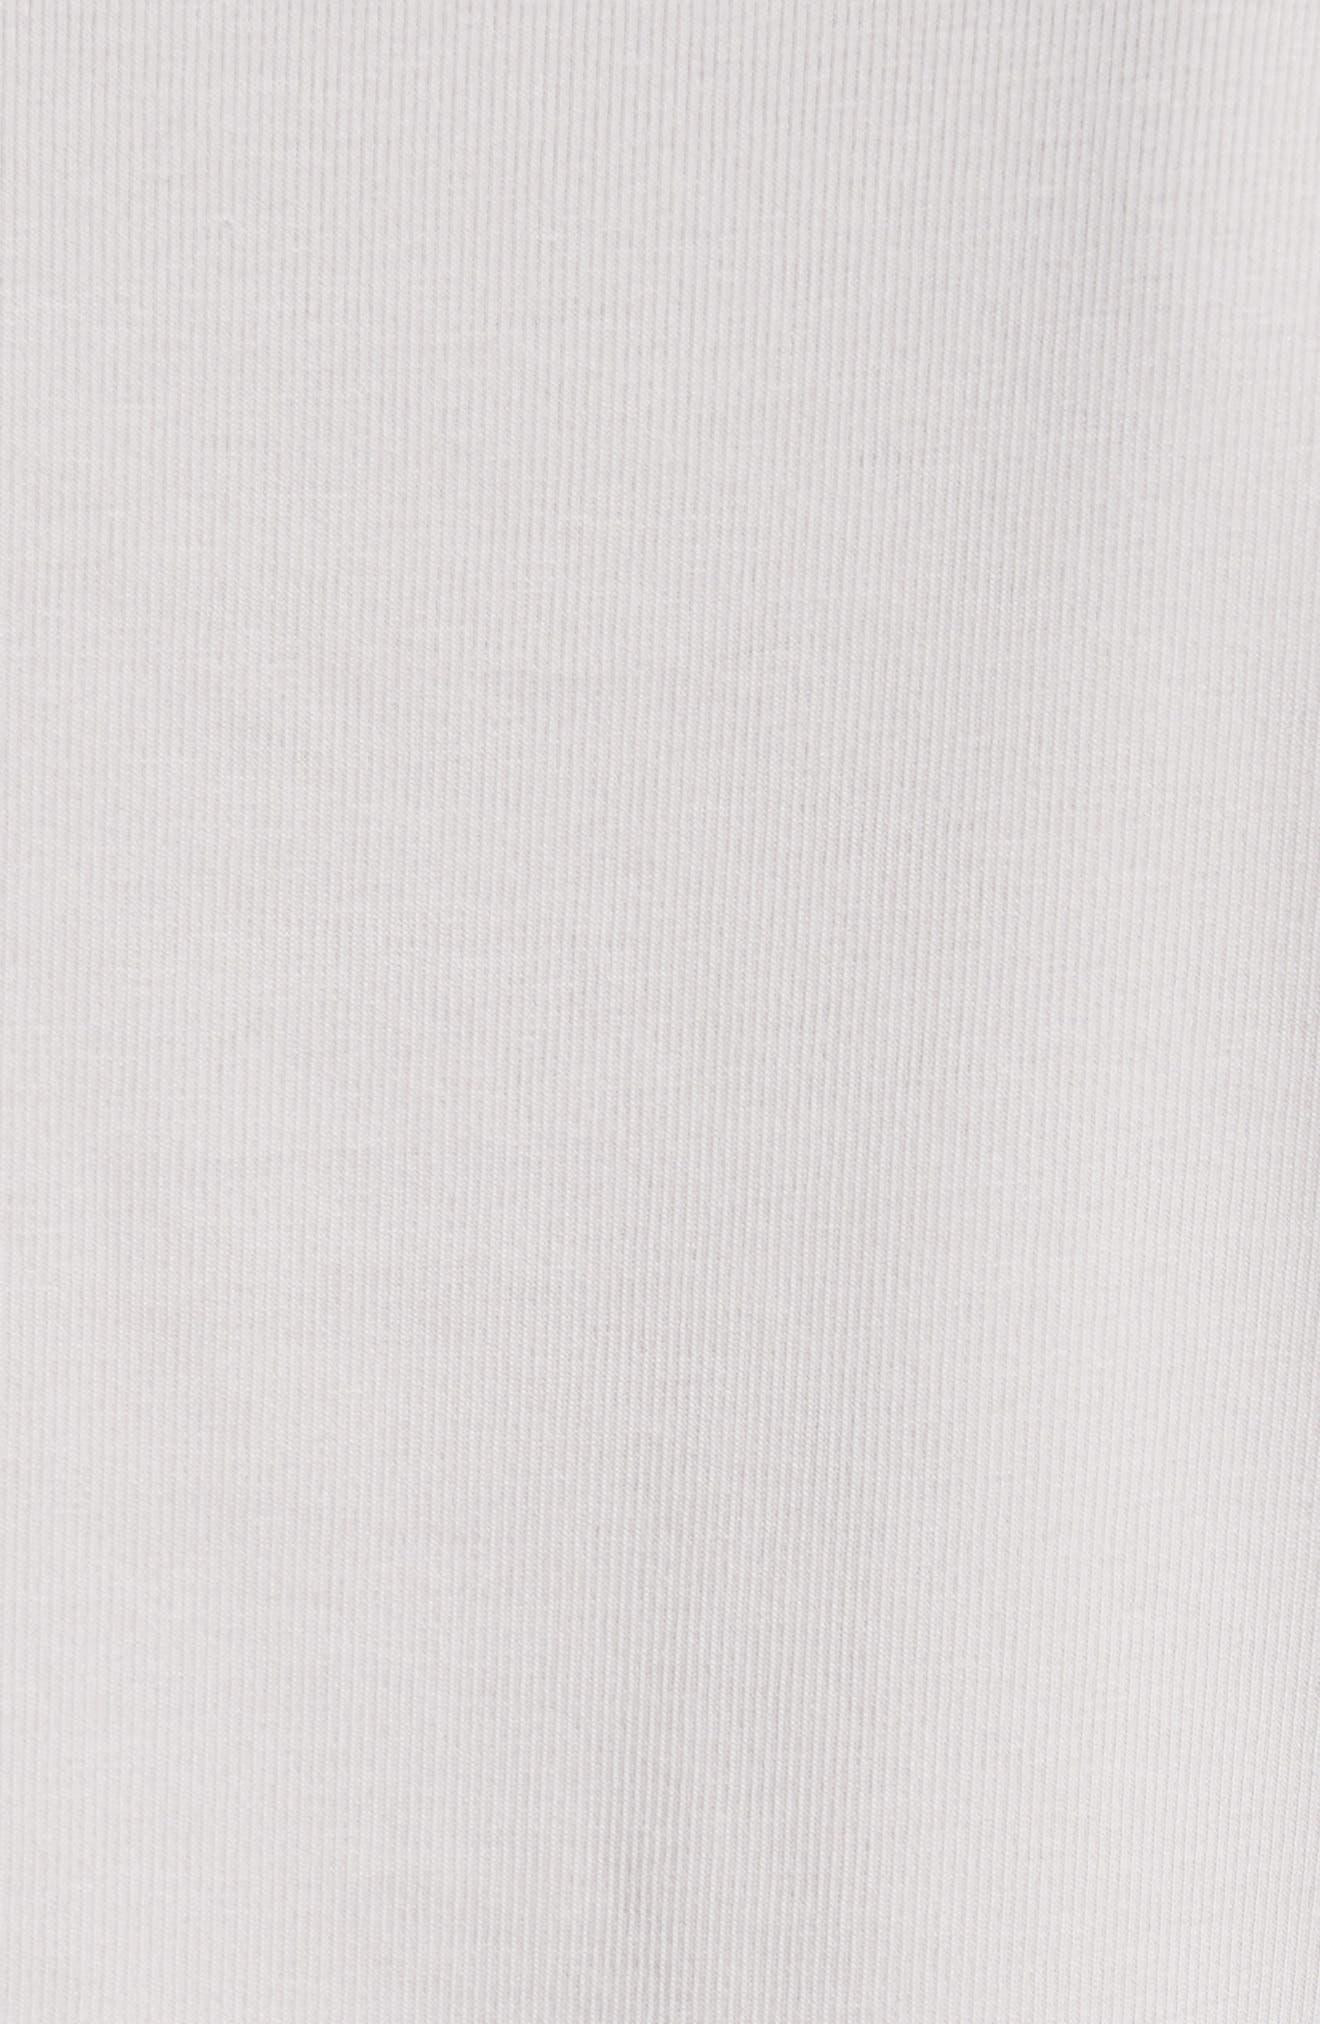 Beaded Crêpe de Chine Front Tank,                             Alternate thumbnail 5, color,                             Grey